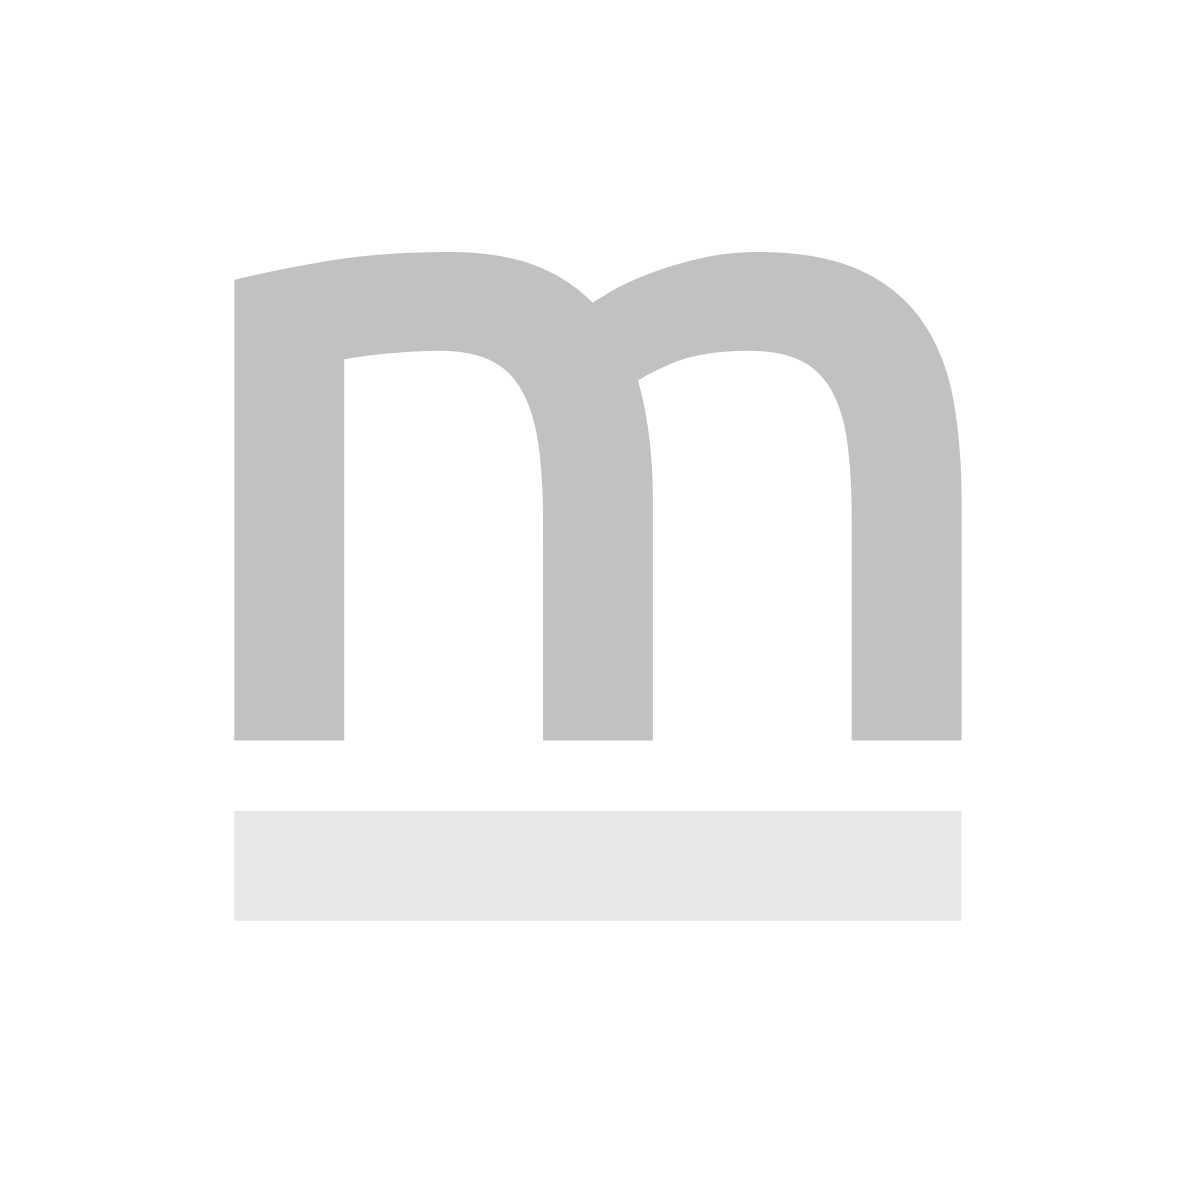 Fototapeta - Słońce i bambus